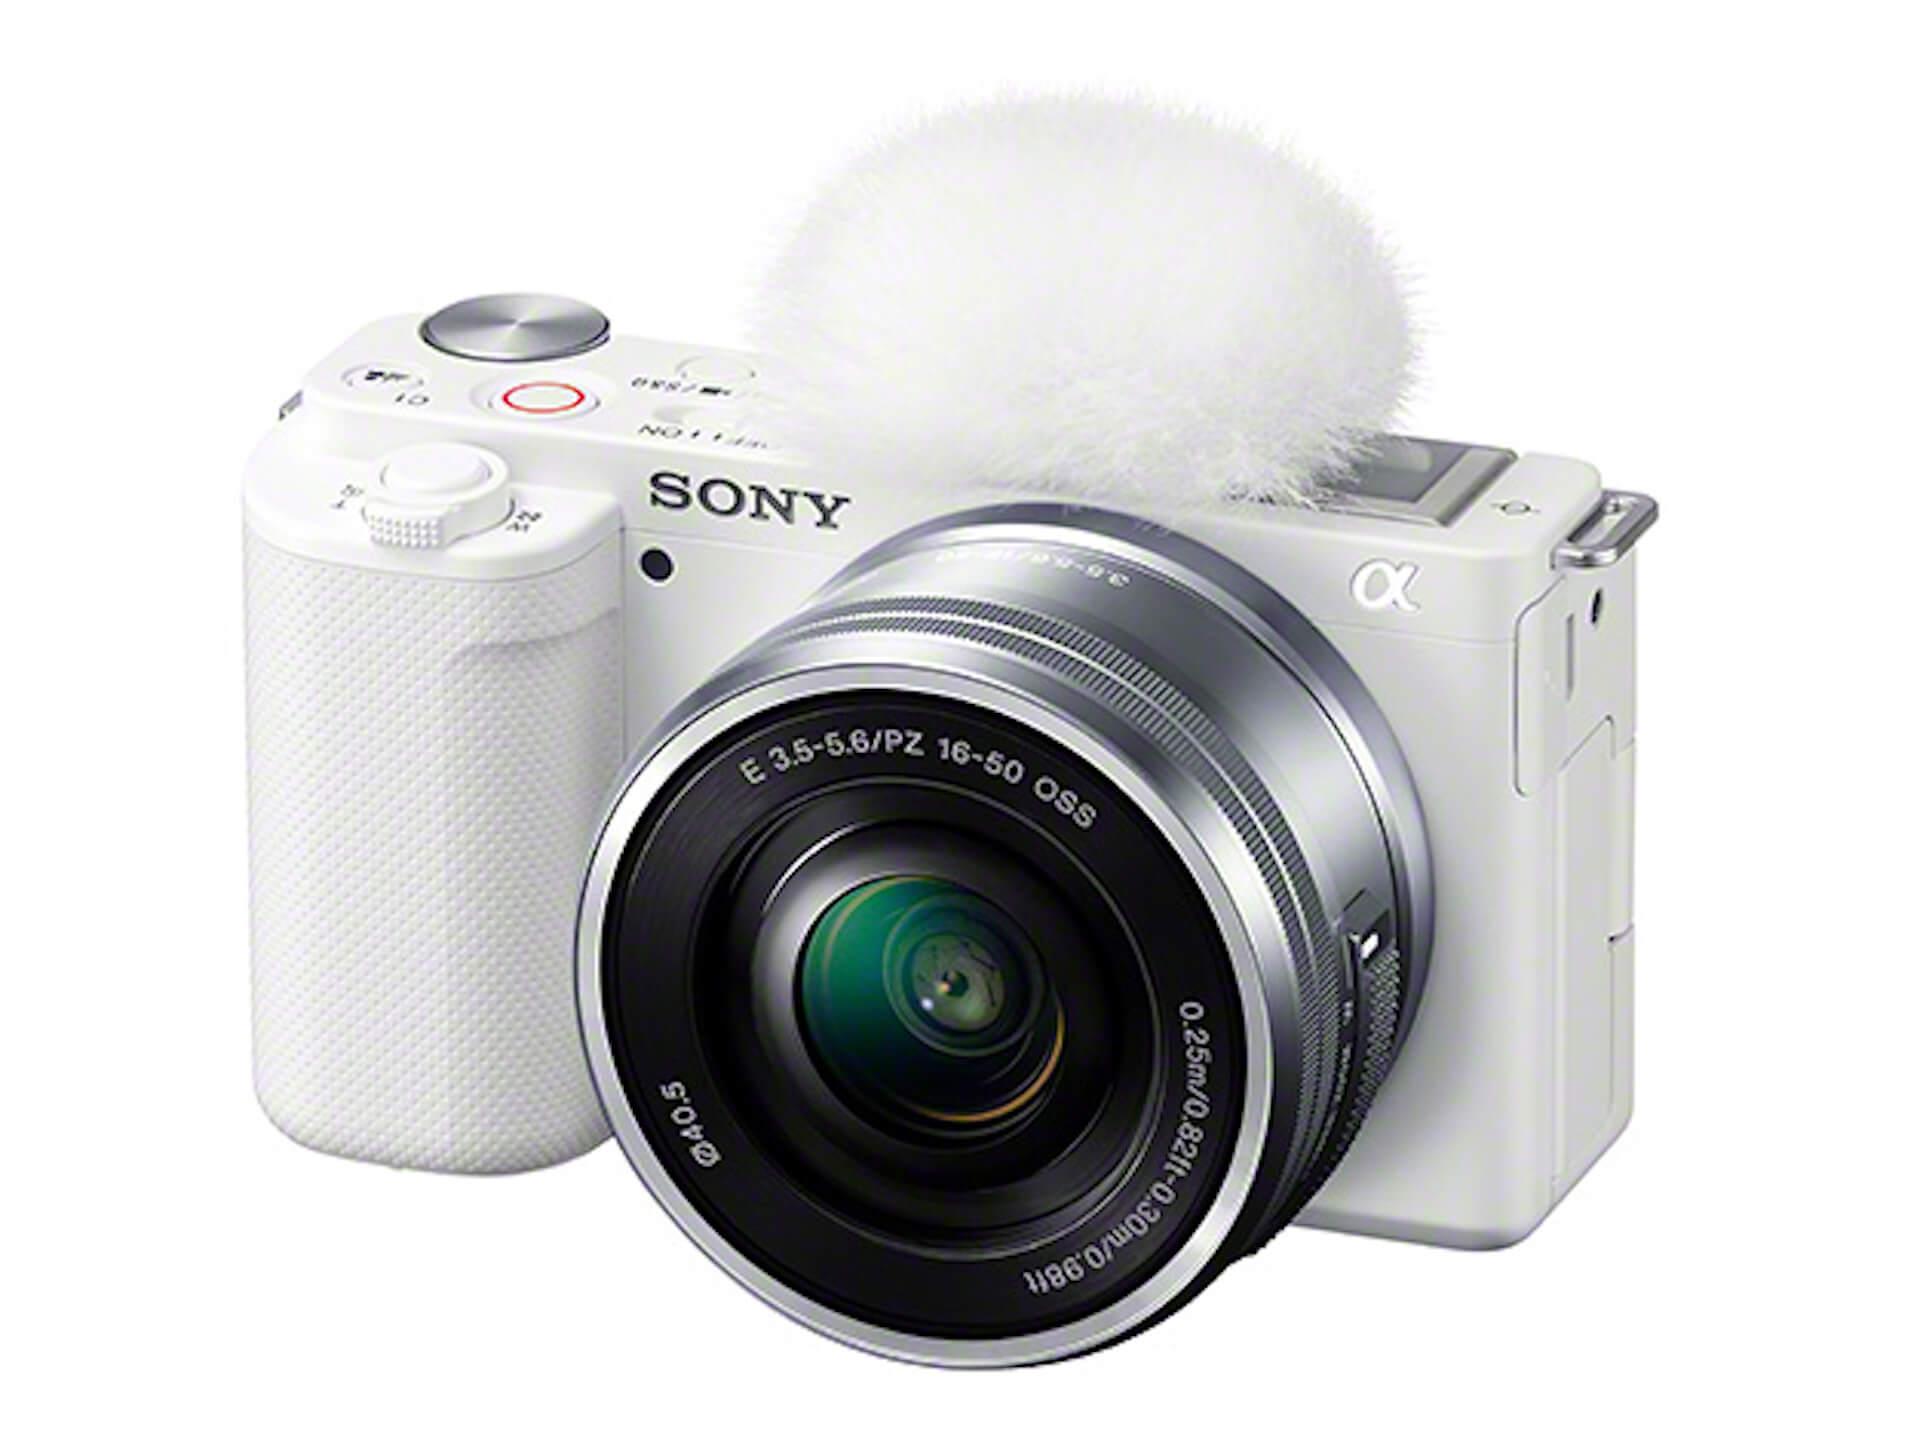 SONYからVlog撮影に特化したαTMシリーズ初のレンズ交換式カメラ「VLOGCAMTM ZV-E10」が発売! tech_210729_sonyvlogcam3